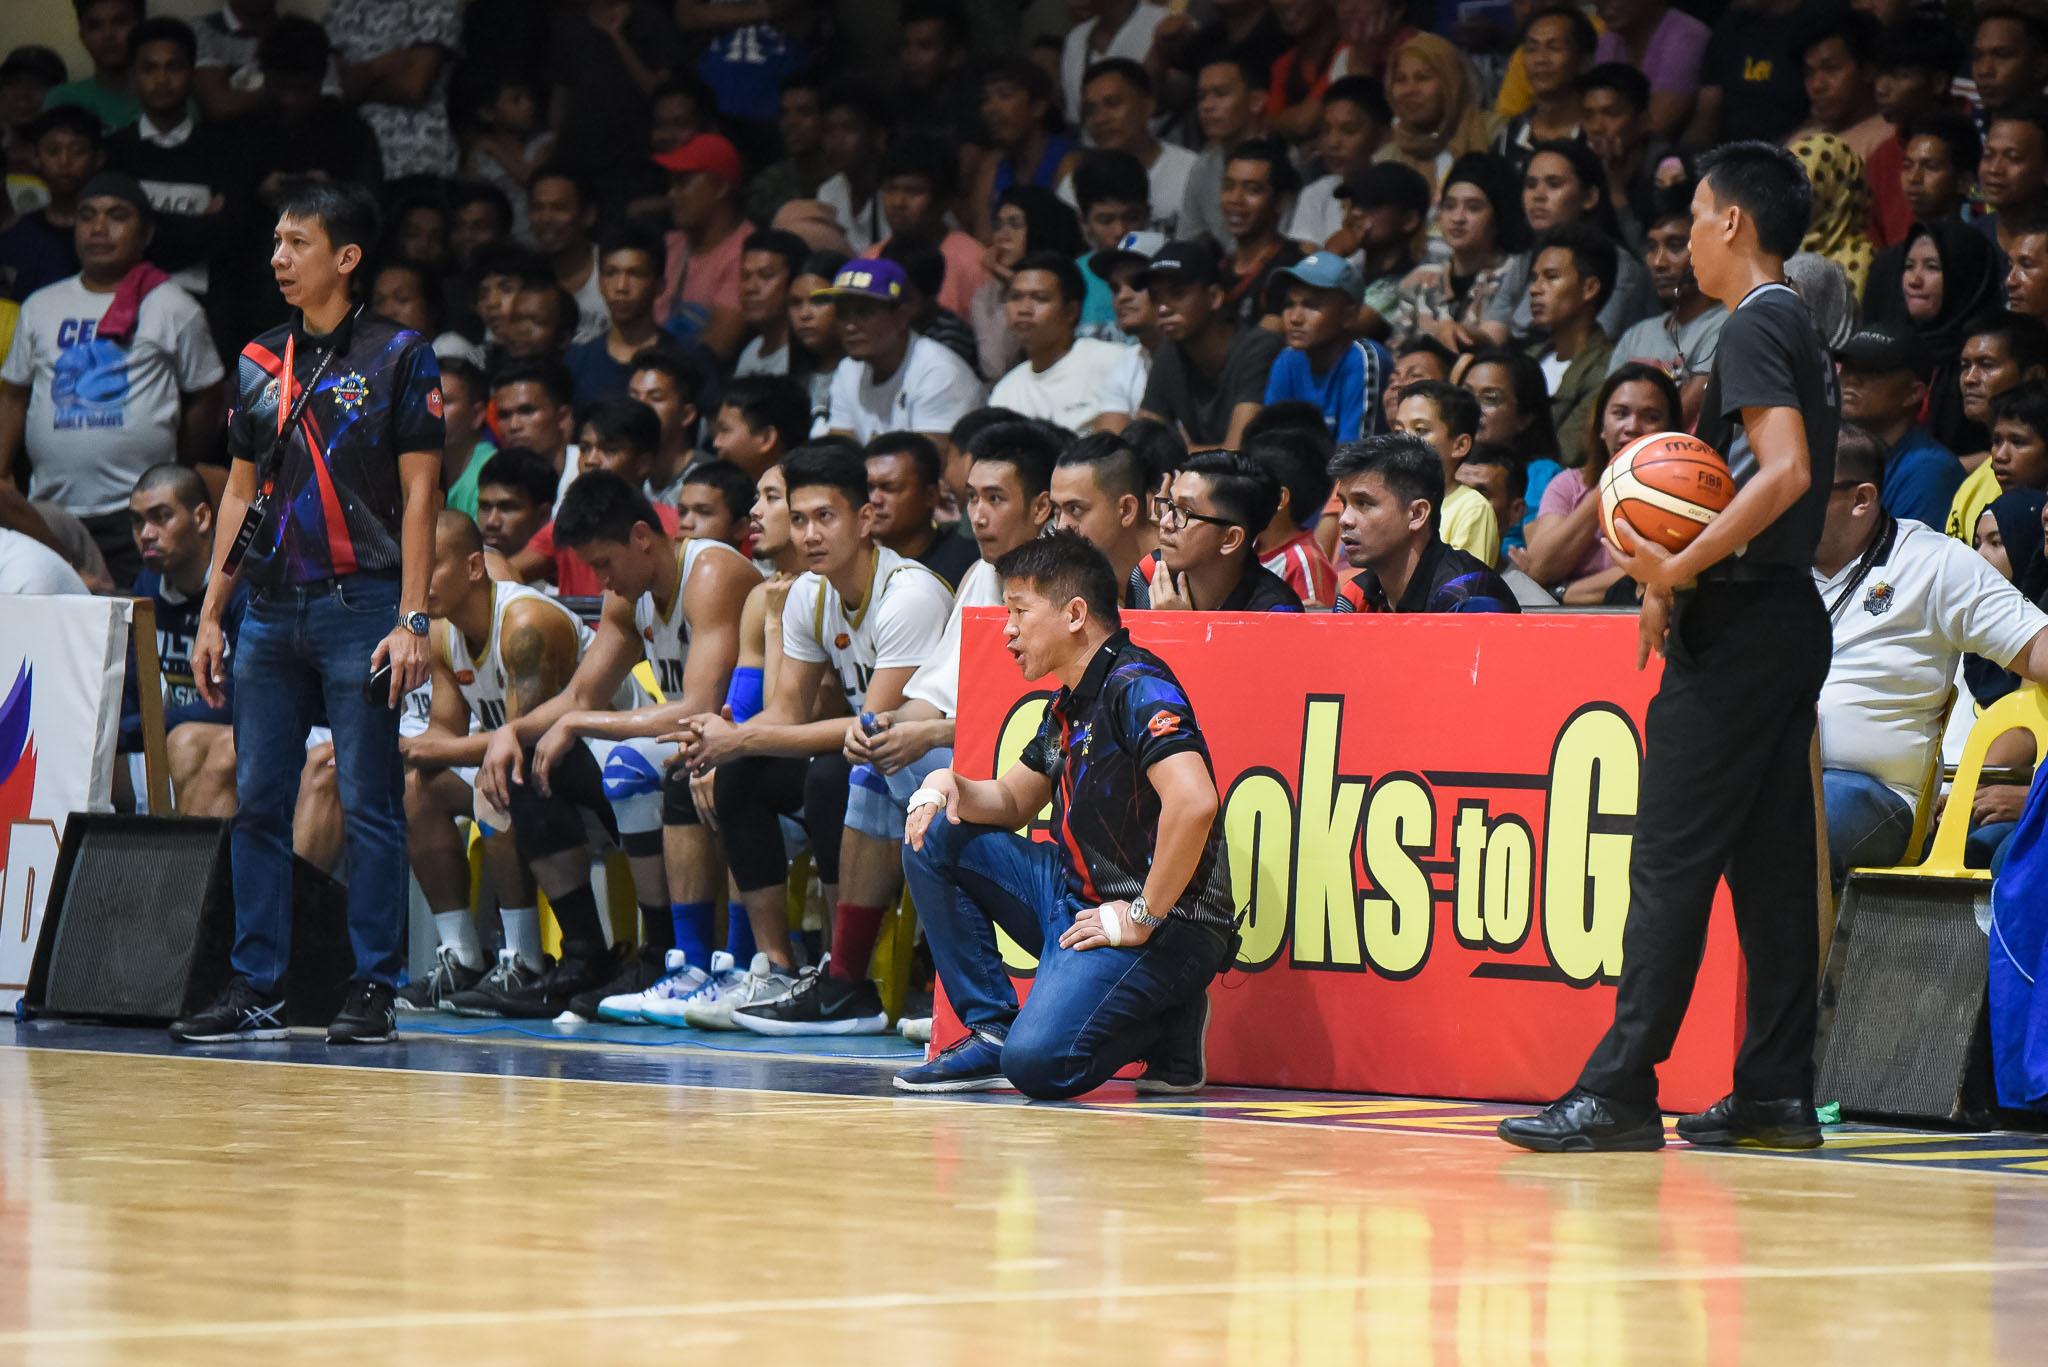 Chooks-MPBL-2019-Basilan-vs-Iloilo-Gonzales Nash Racela admits losing interest in PBA after TNT dismissal Basketball News PBA  - philippine sports news